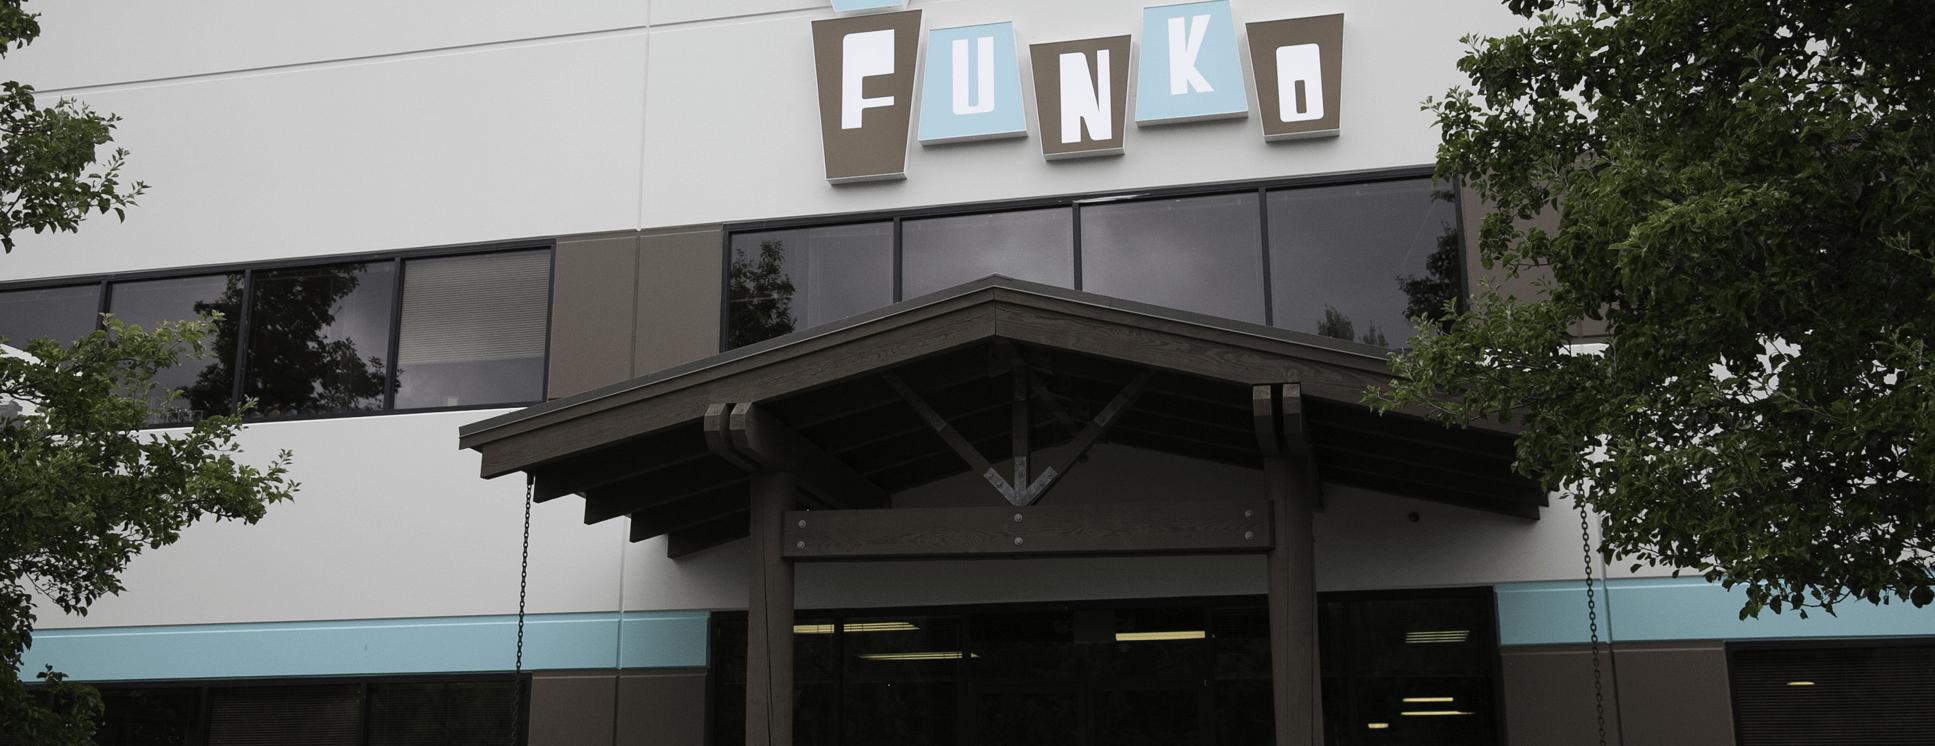 Funko Warehouse